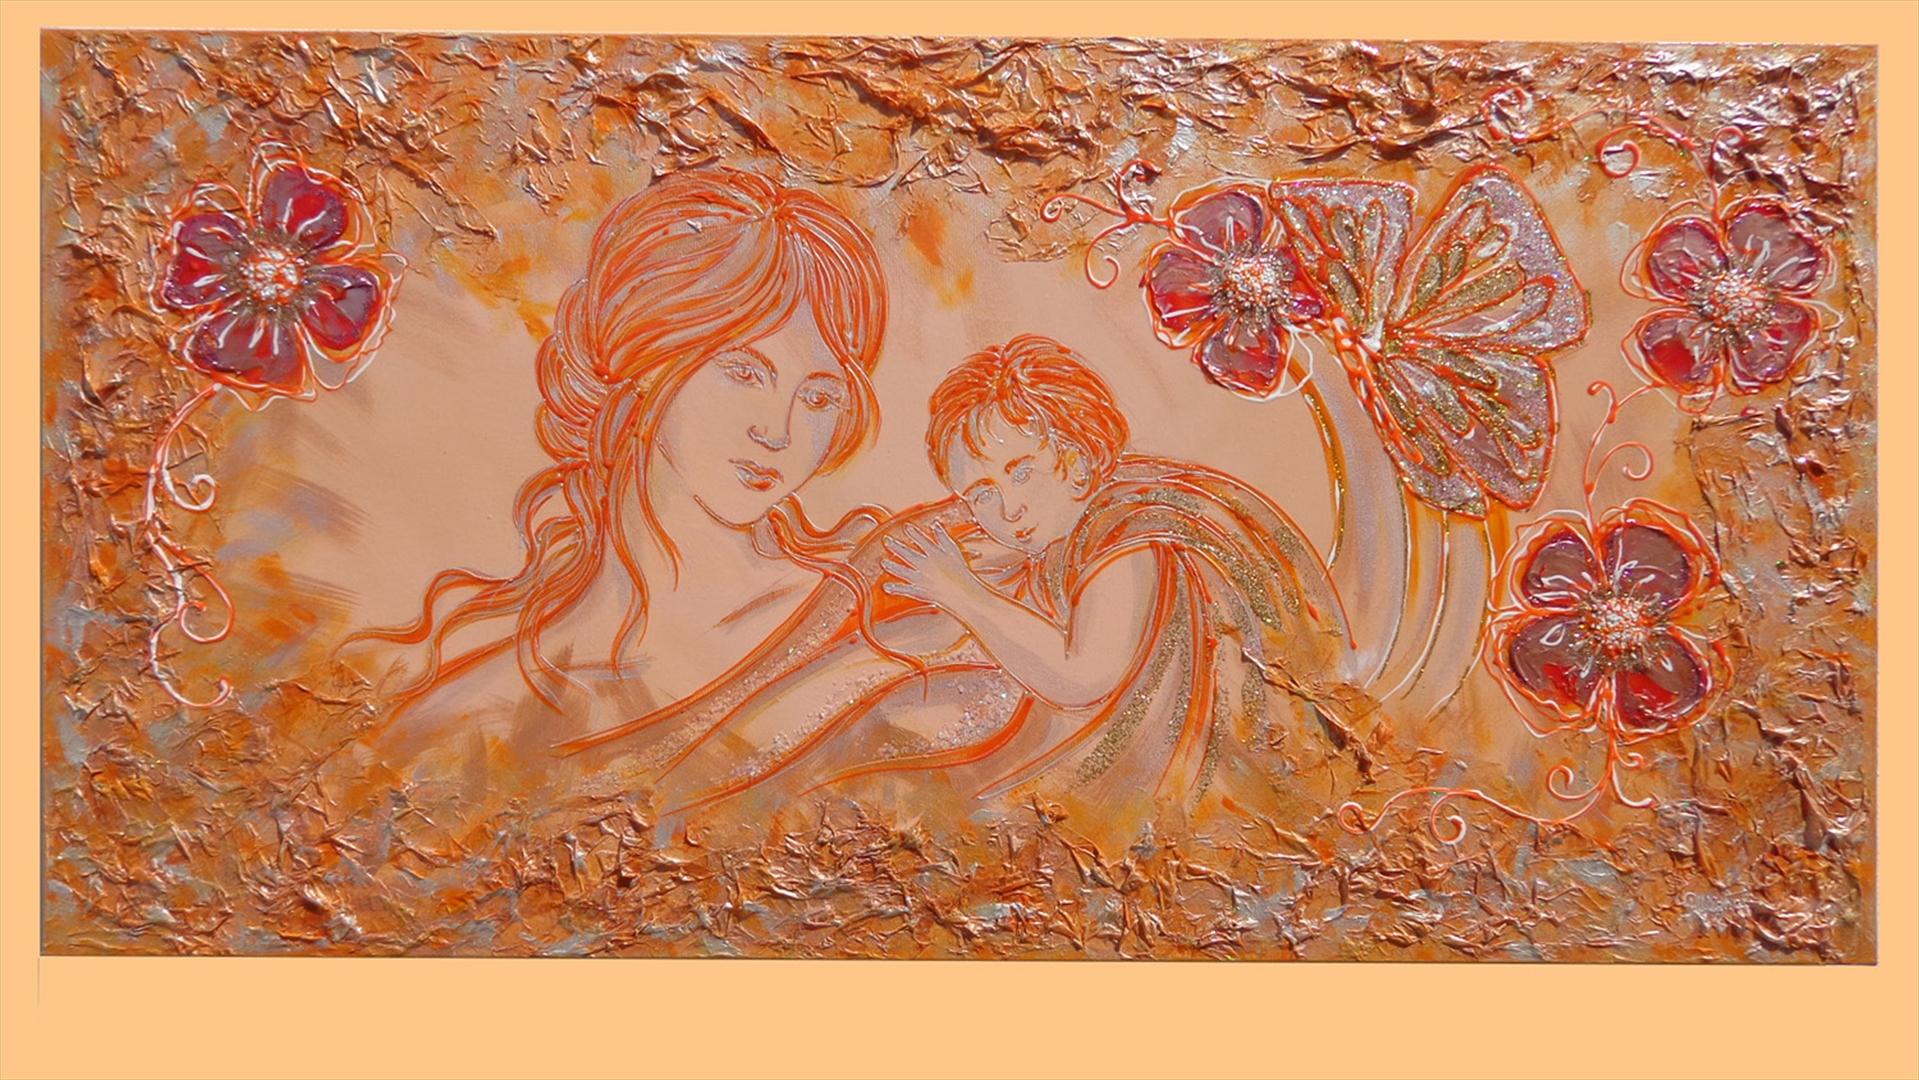 Maternit e fiori arancio vendita quadri online quadri for Immagini quadri fiori